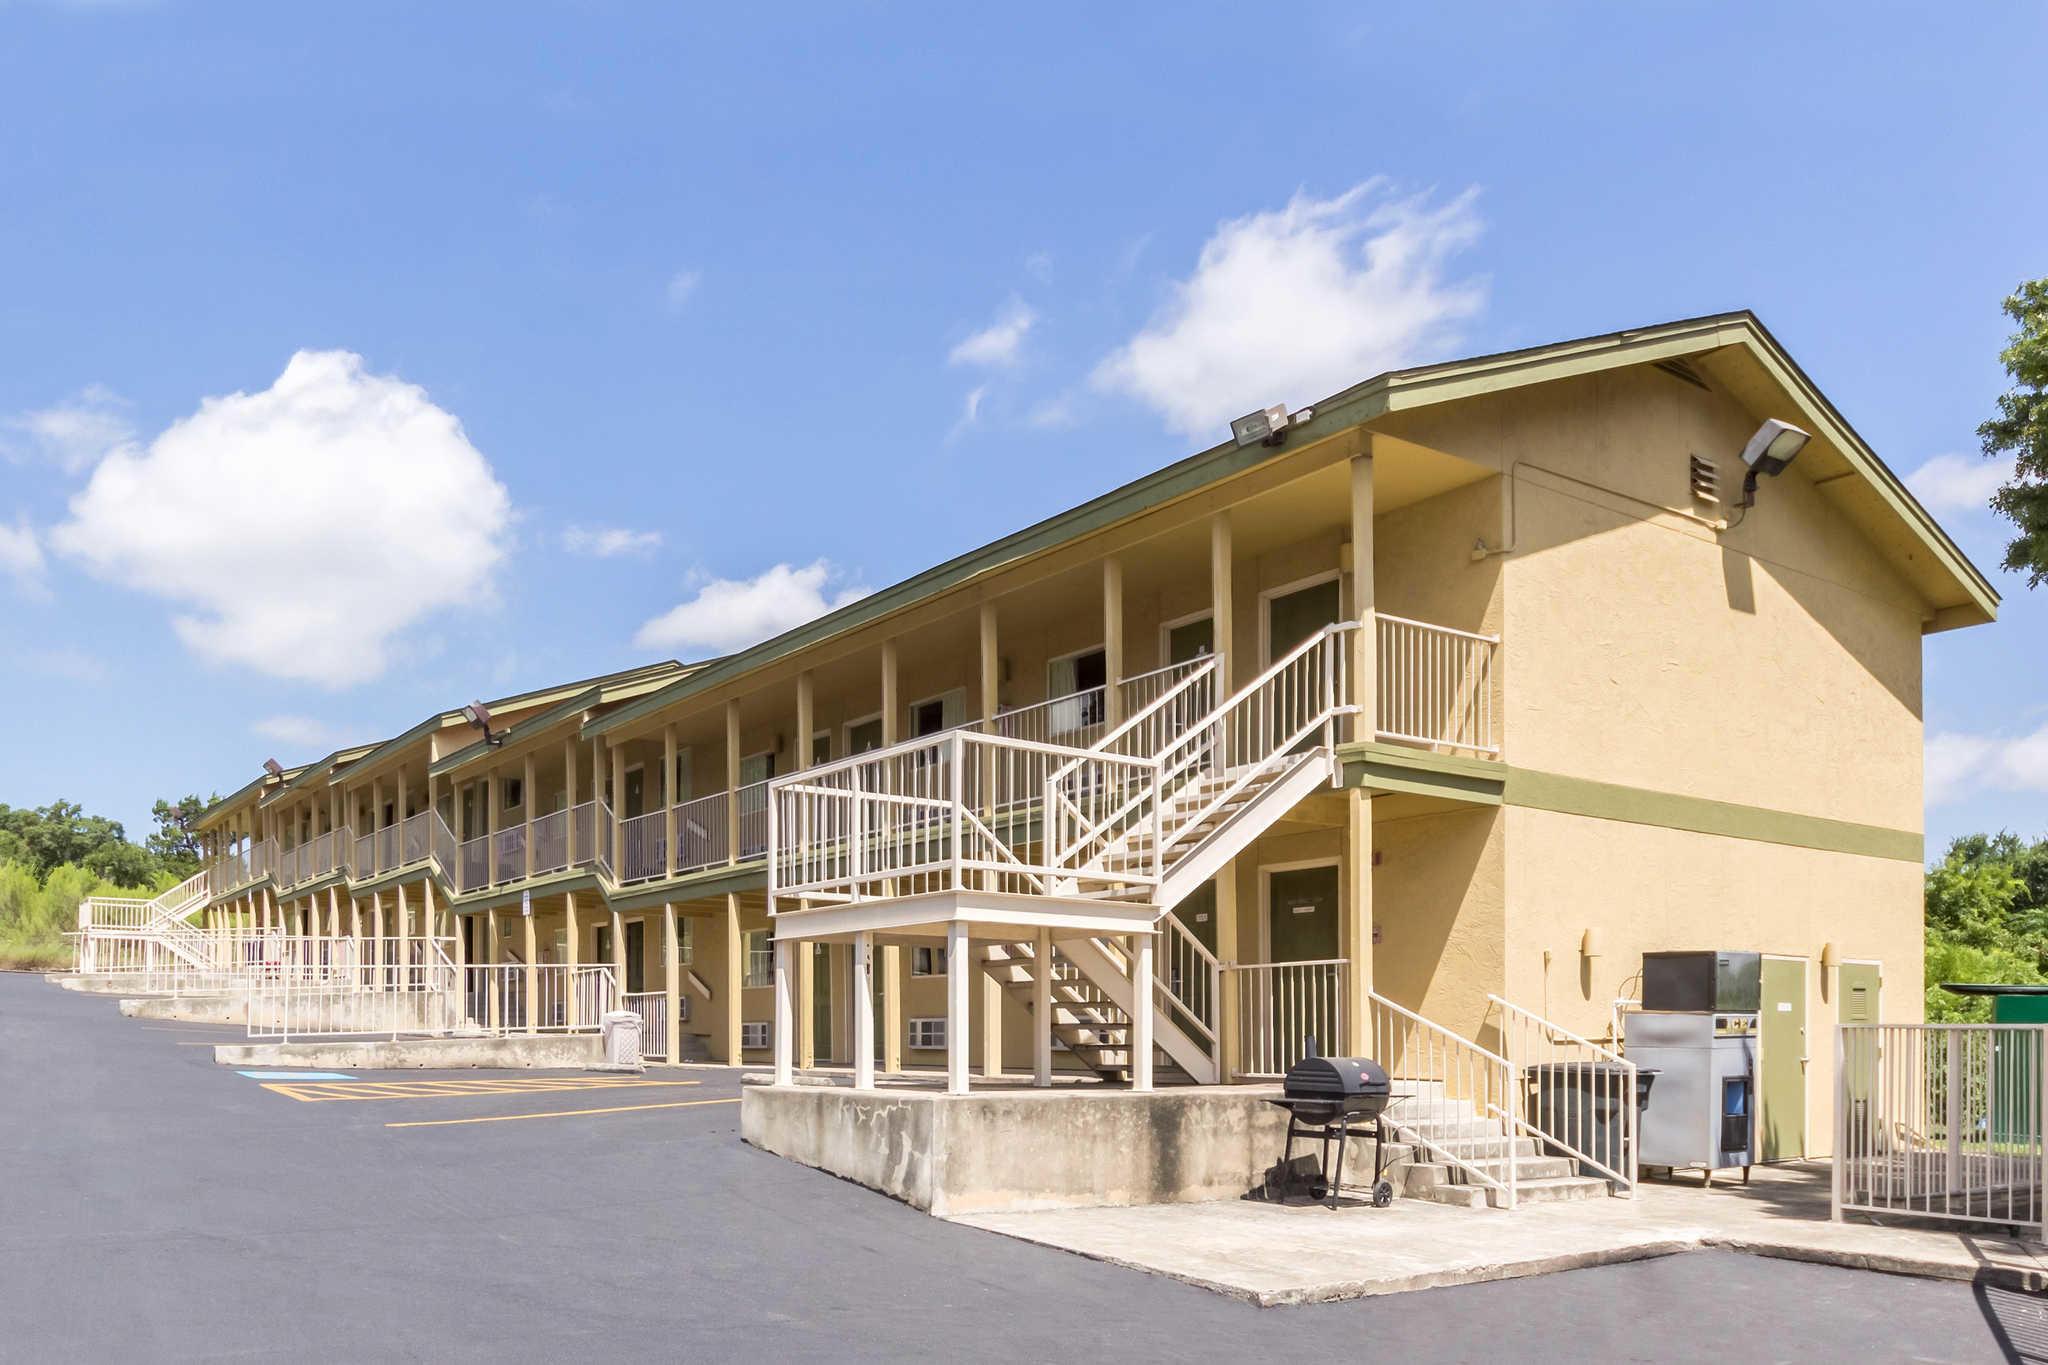 Rodeway Inn at Six Flags image 2